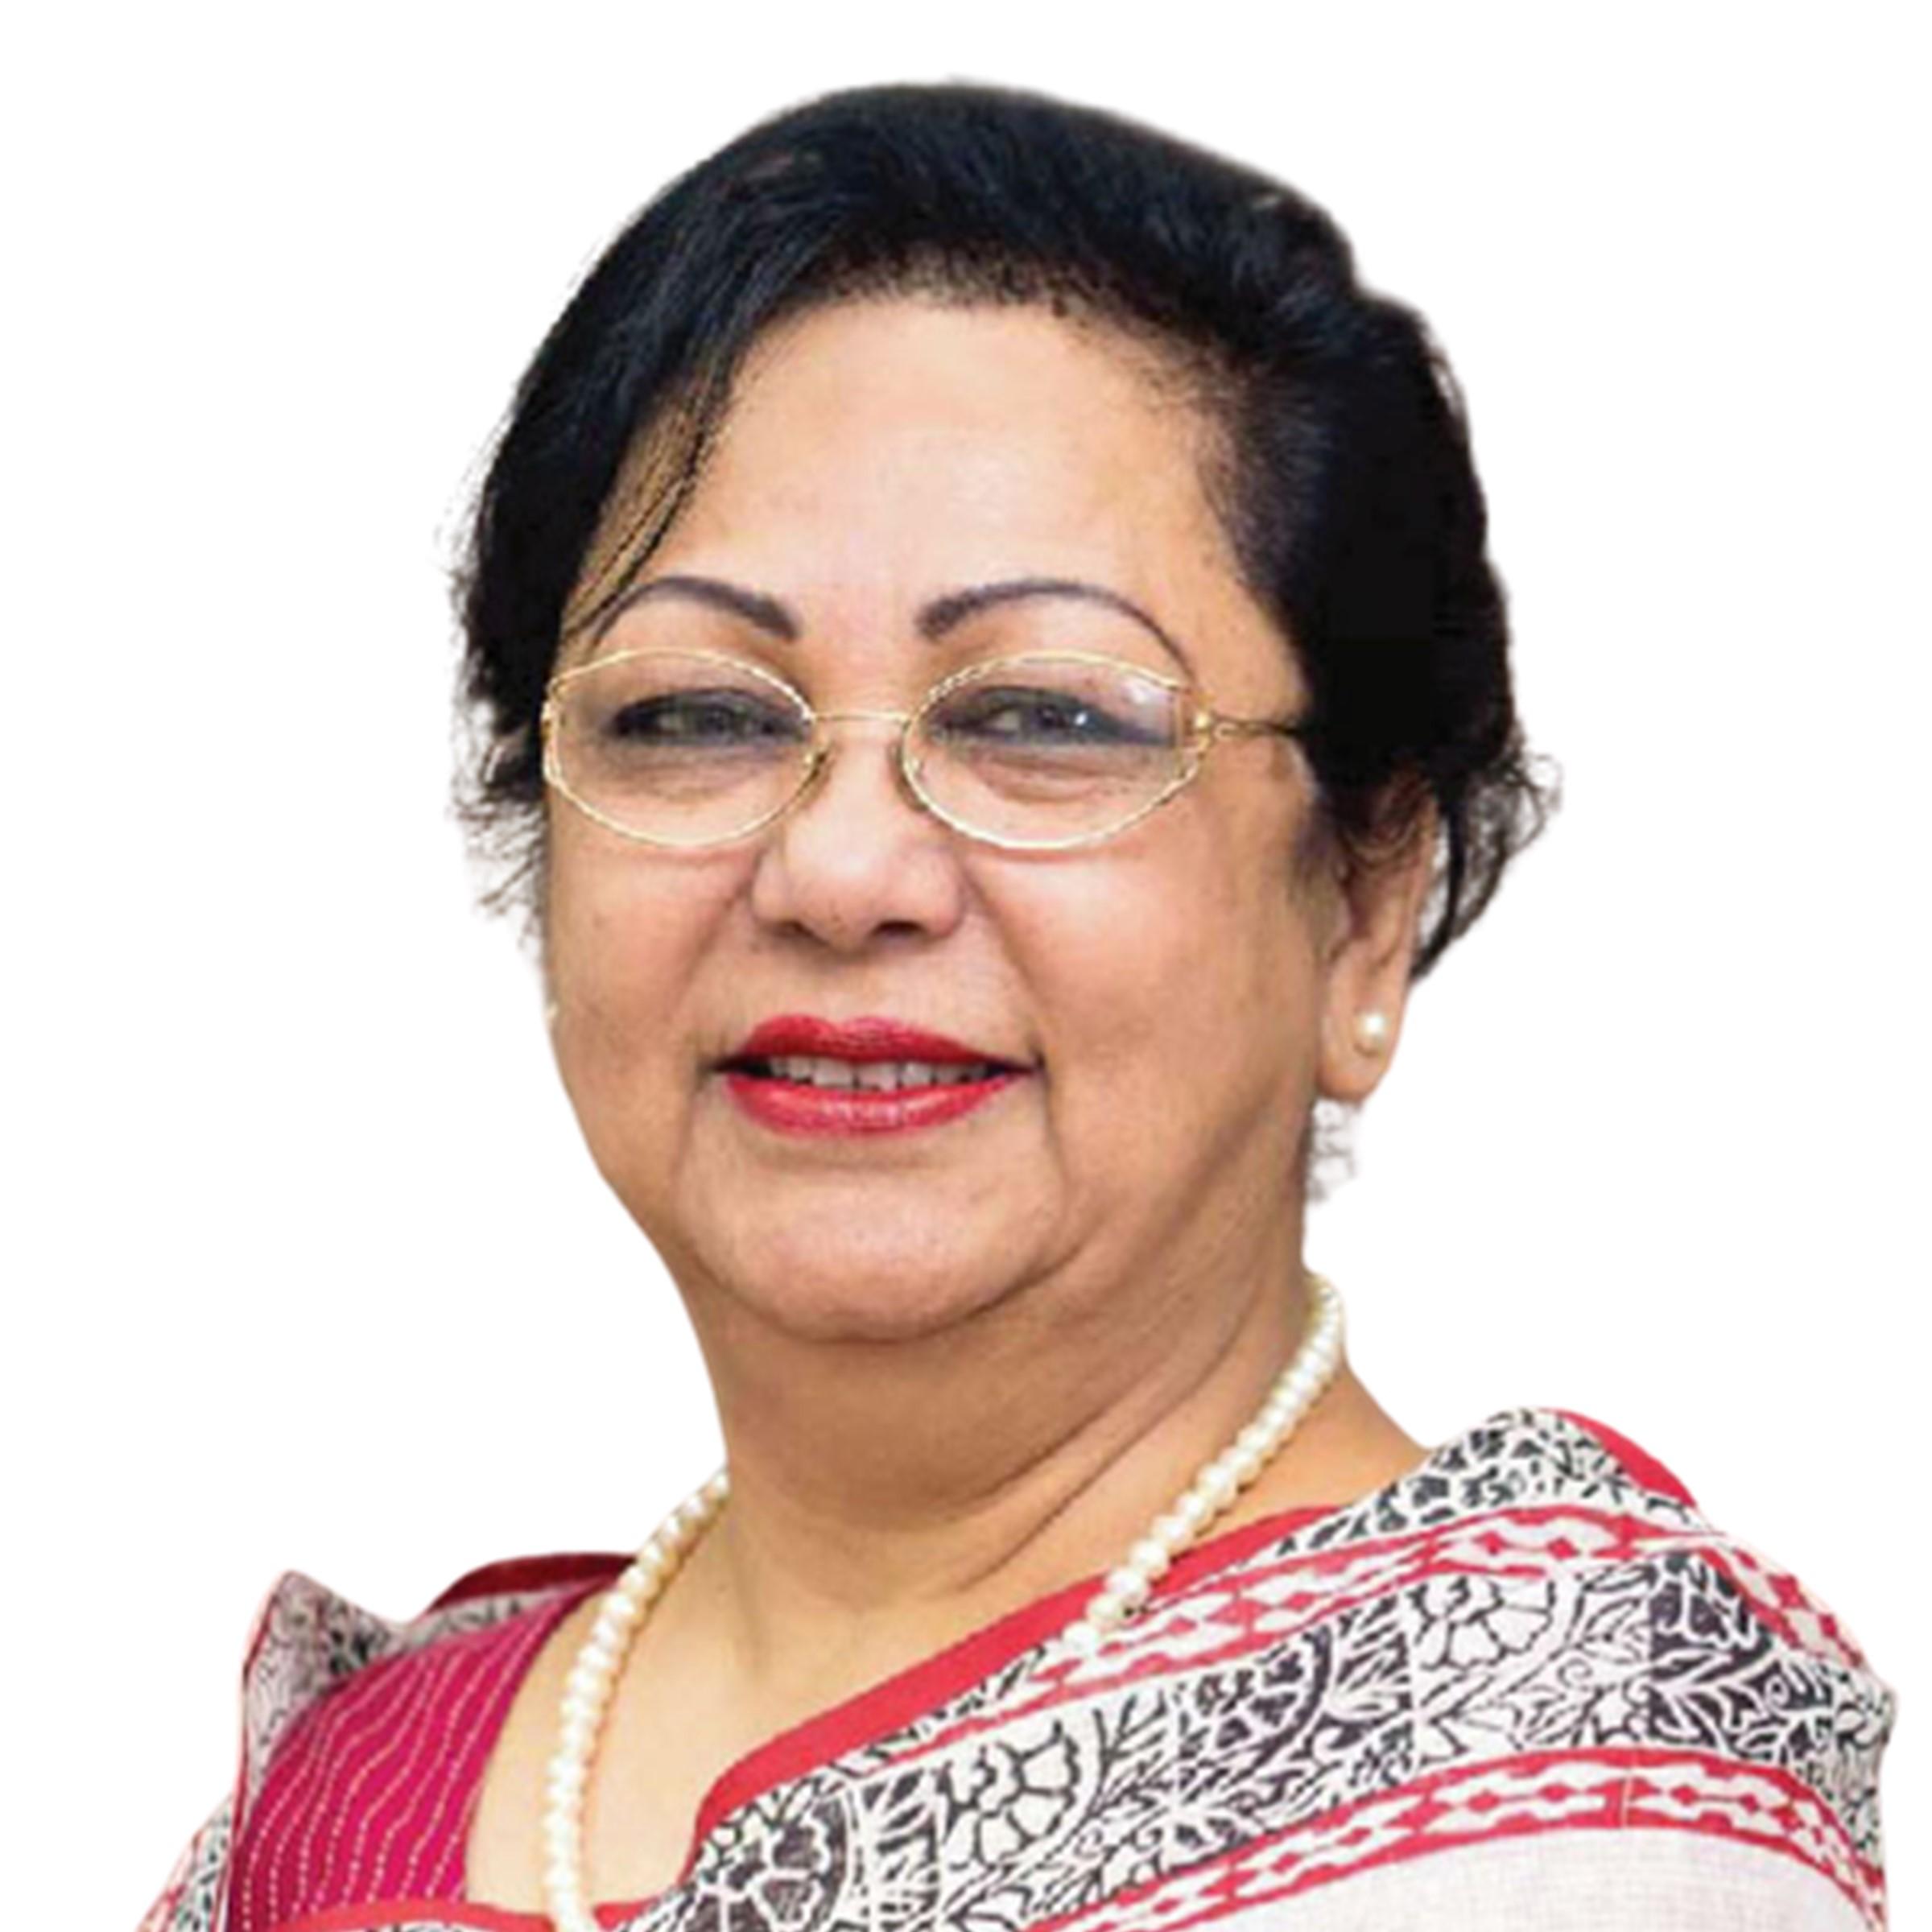 Monwara Hakim Ali